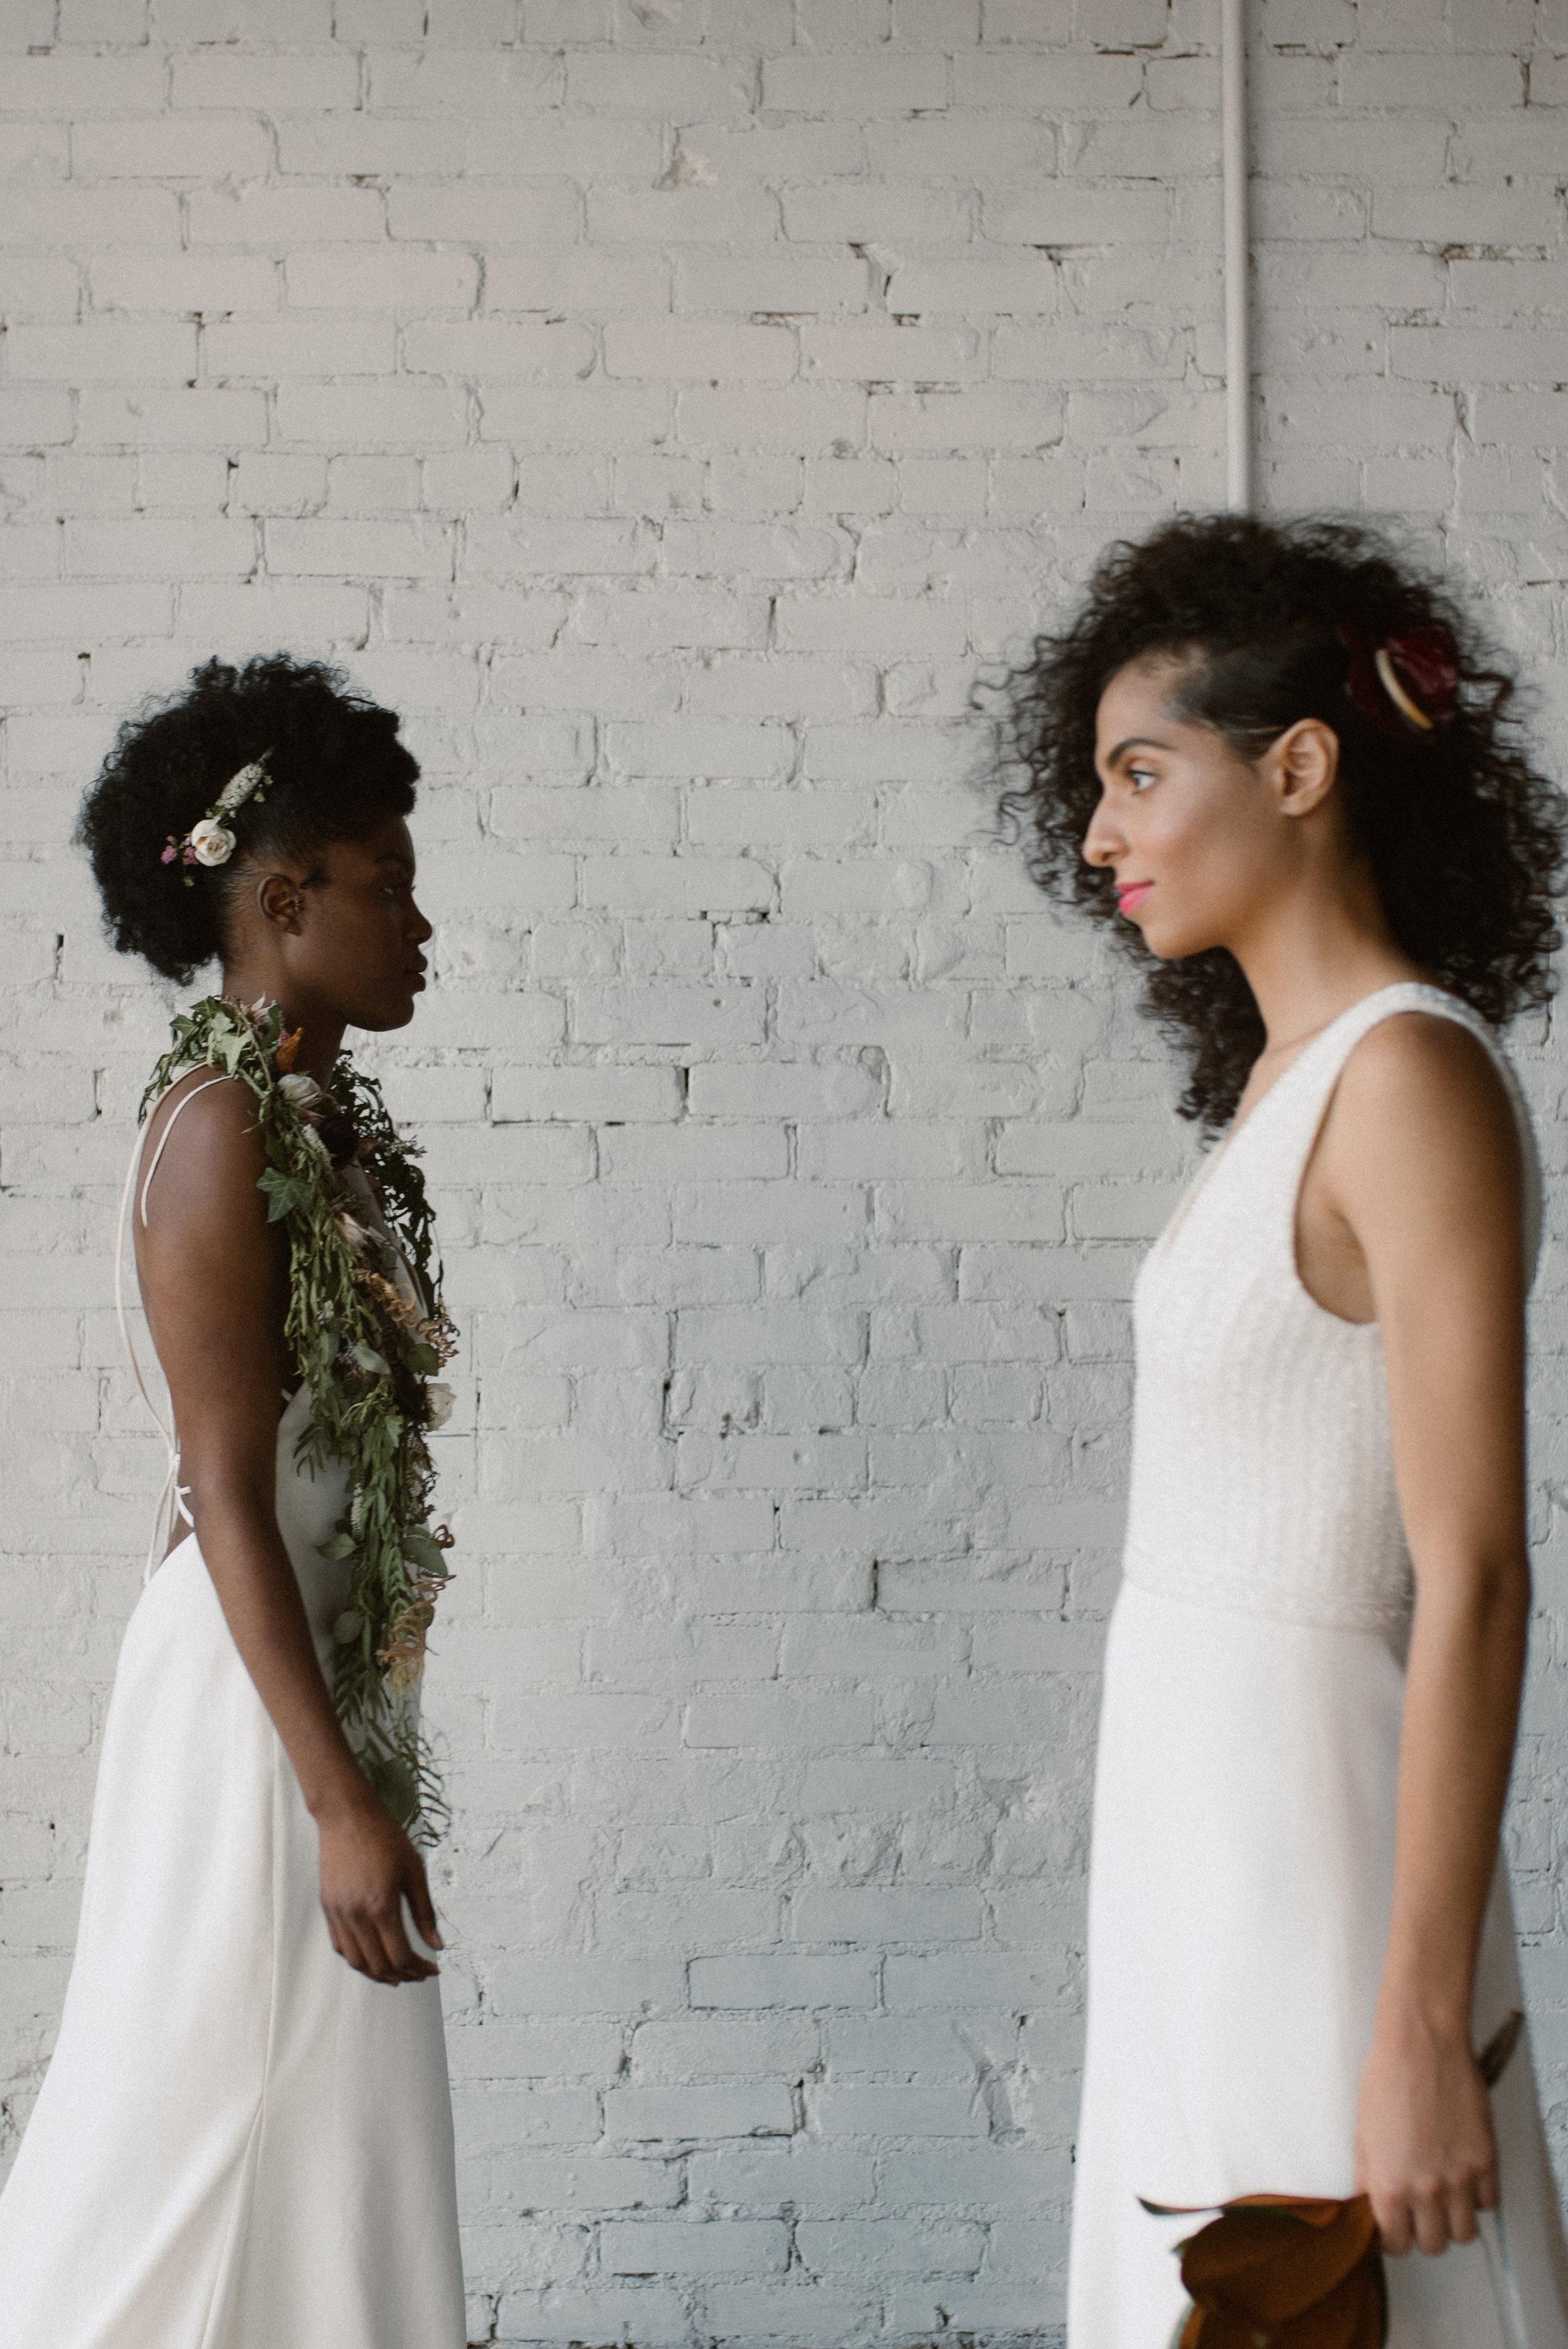 haus-820-minimal-editorial-wedding-styled-shoot-85.jpg